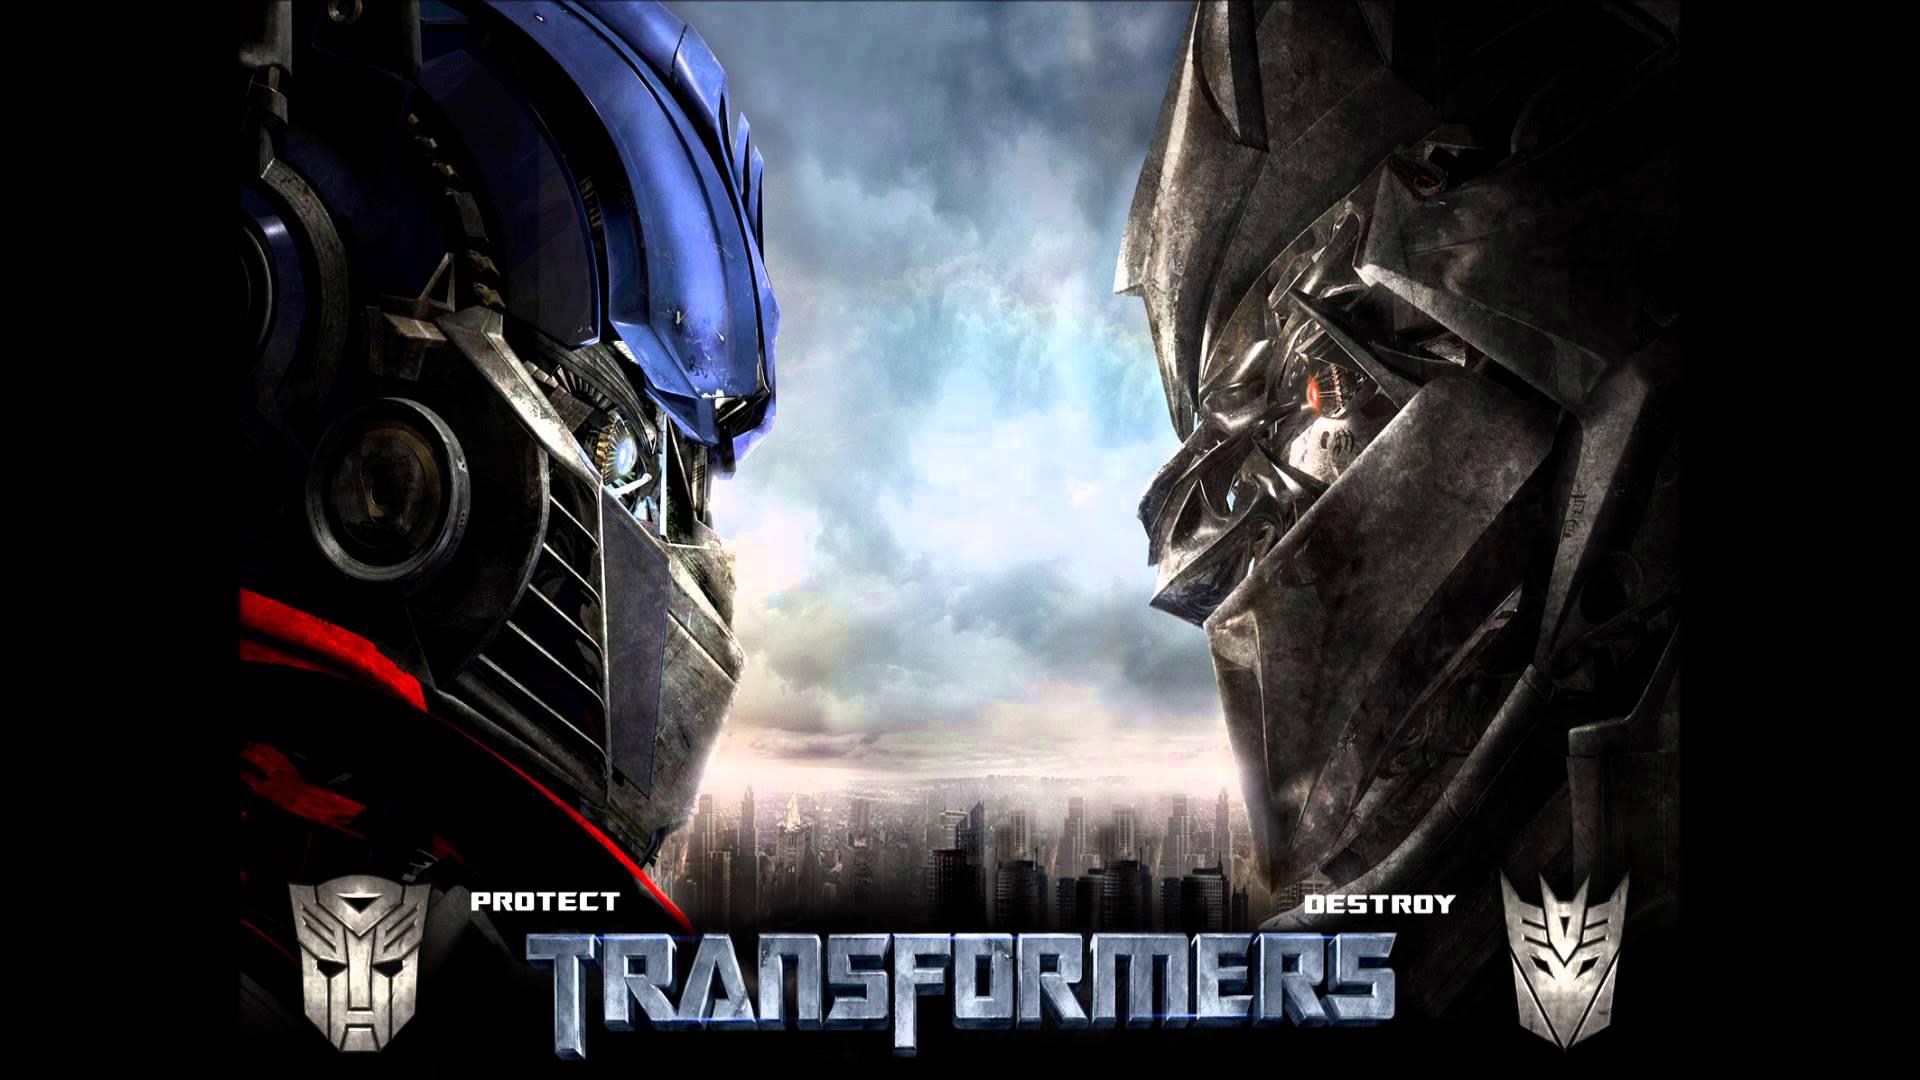 Transformers wallpaper 2 | WallpapersBQ